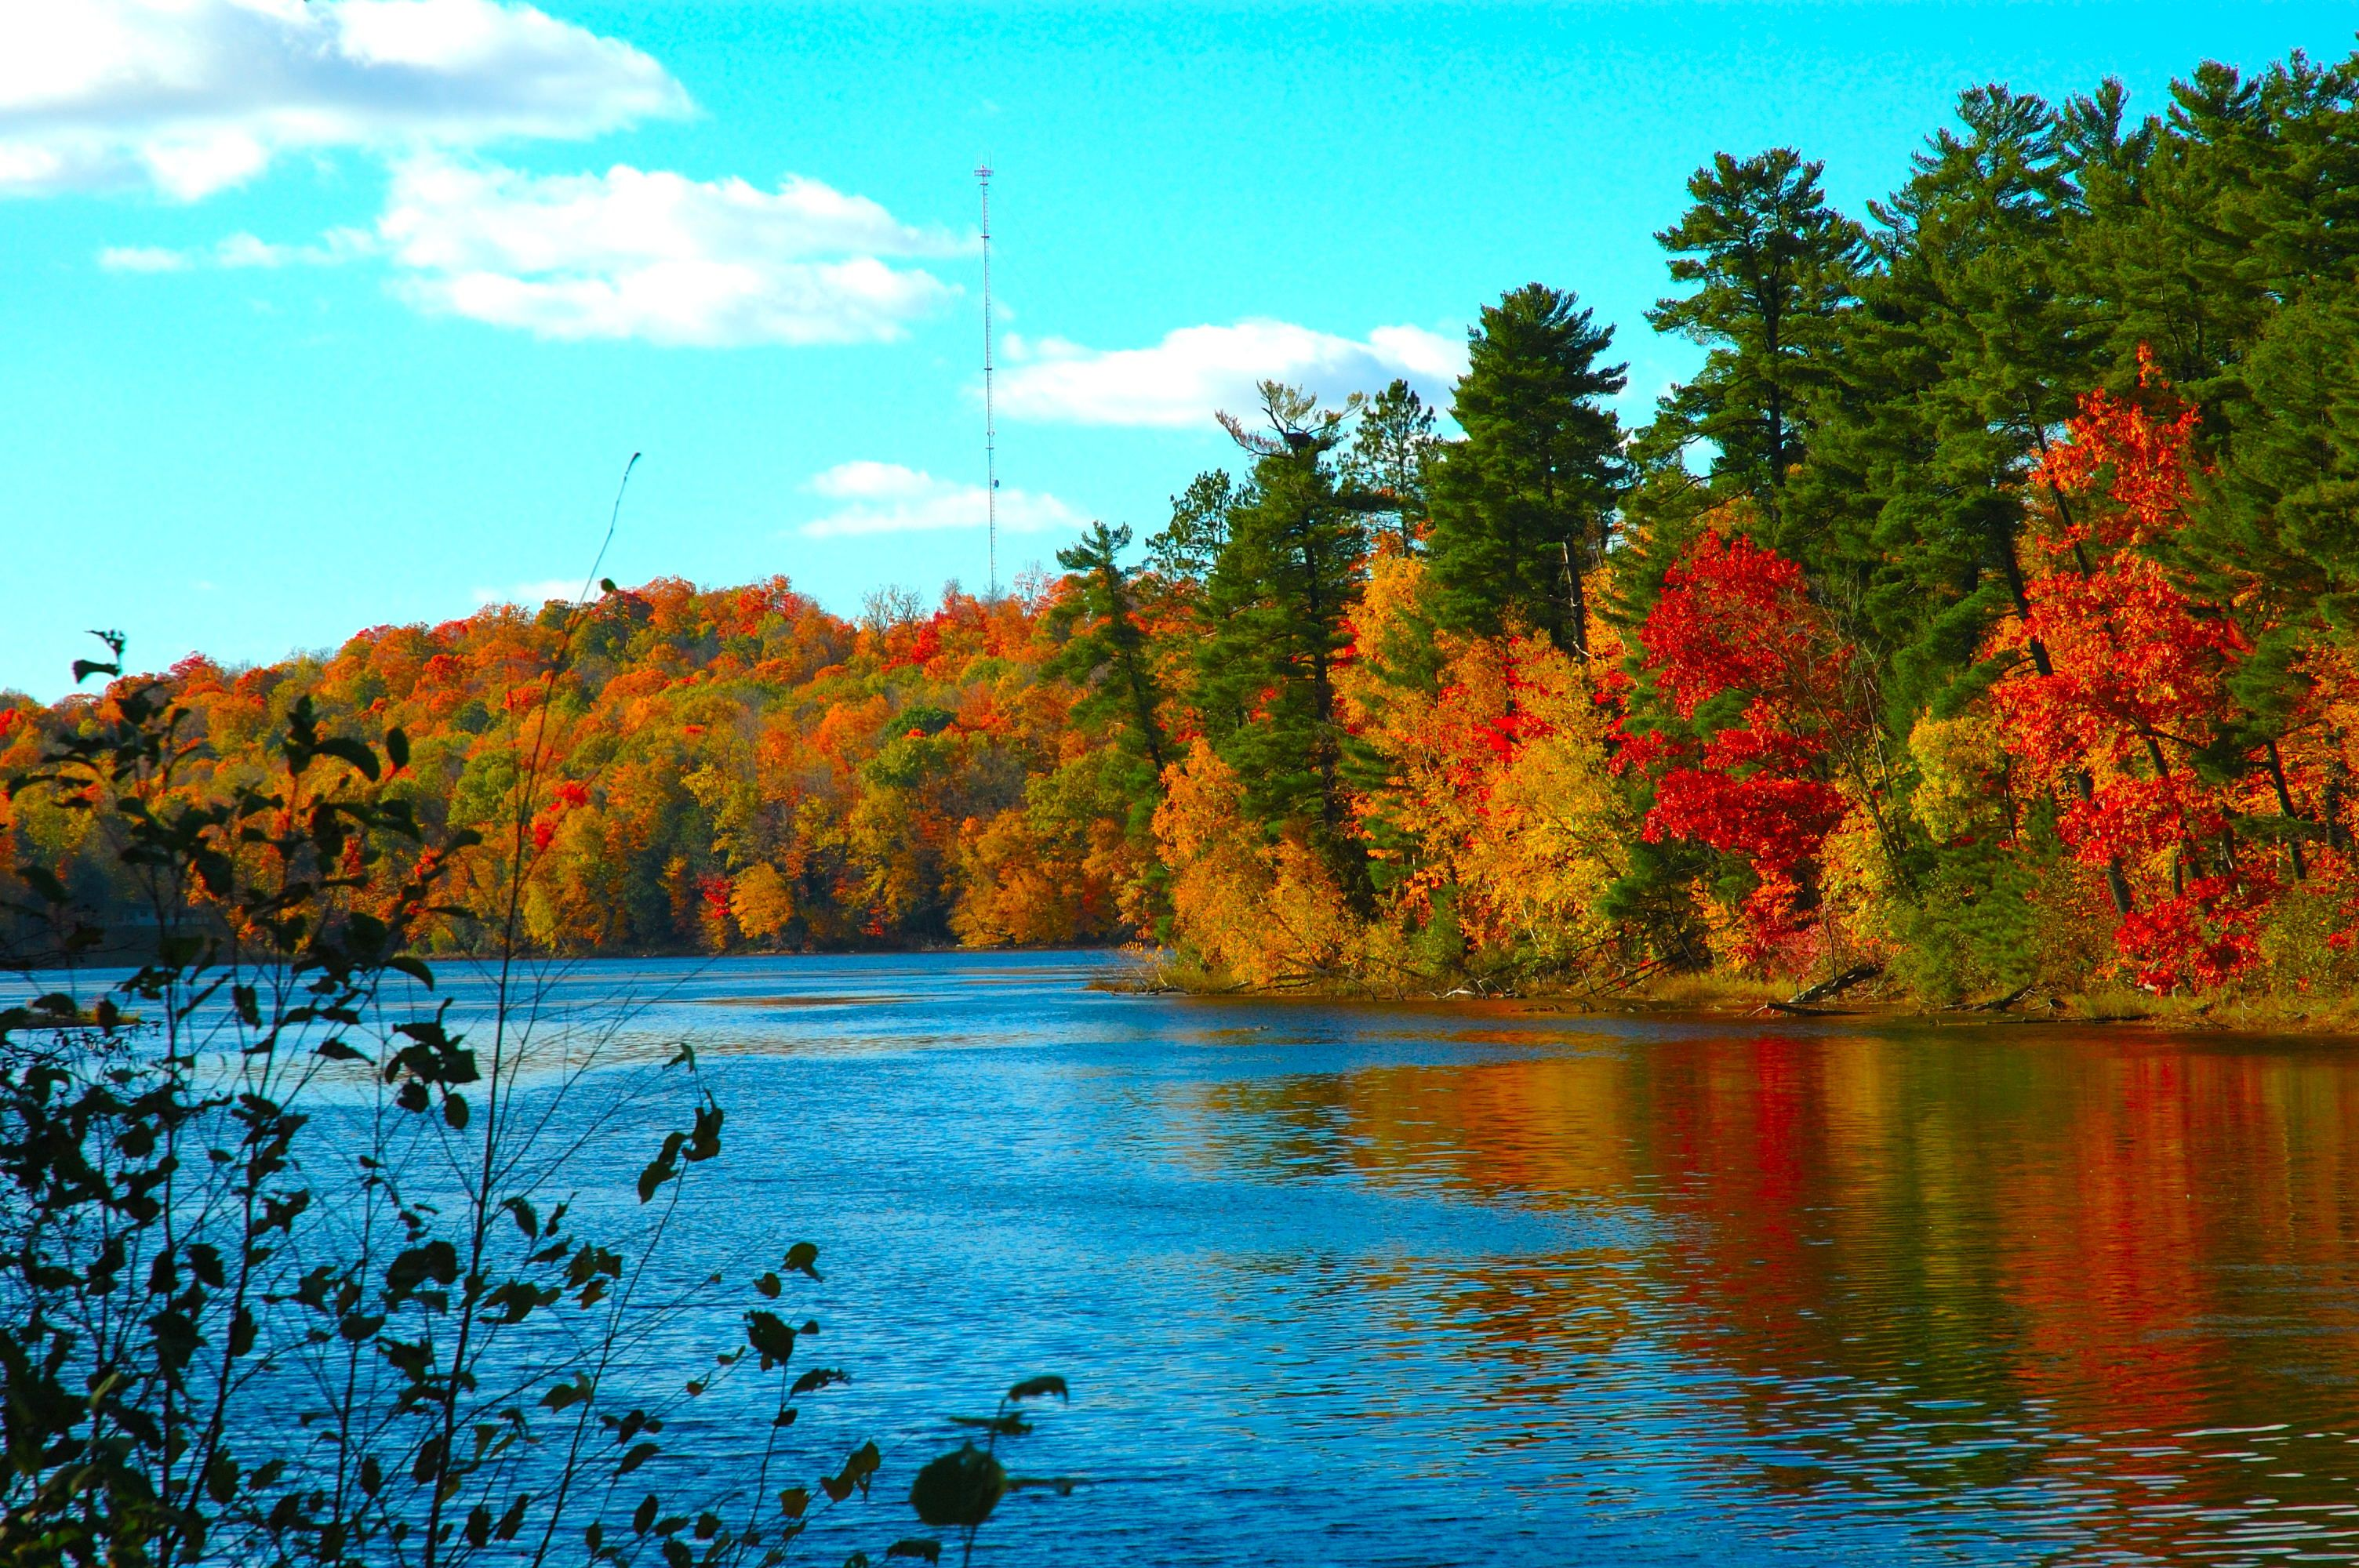 Google Autumn Wallpaper For Desktop Free Autumn Wallpapers